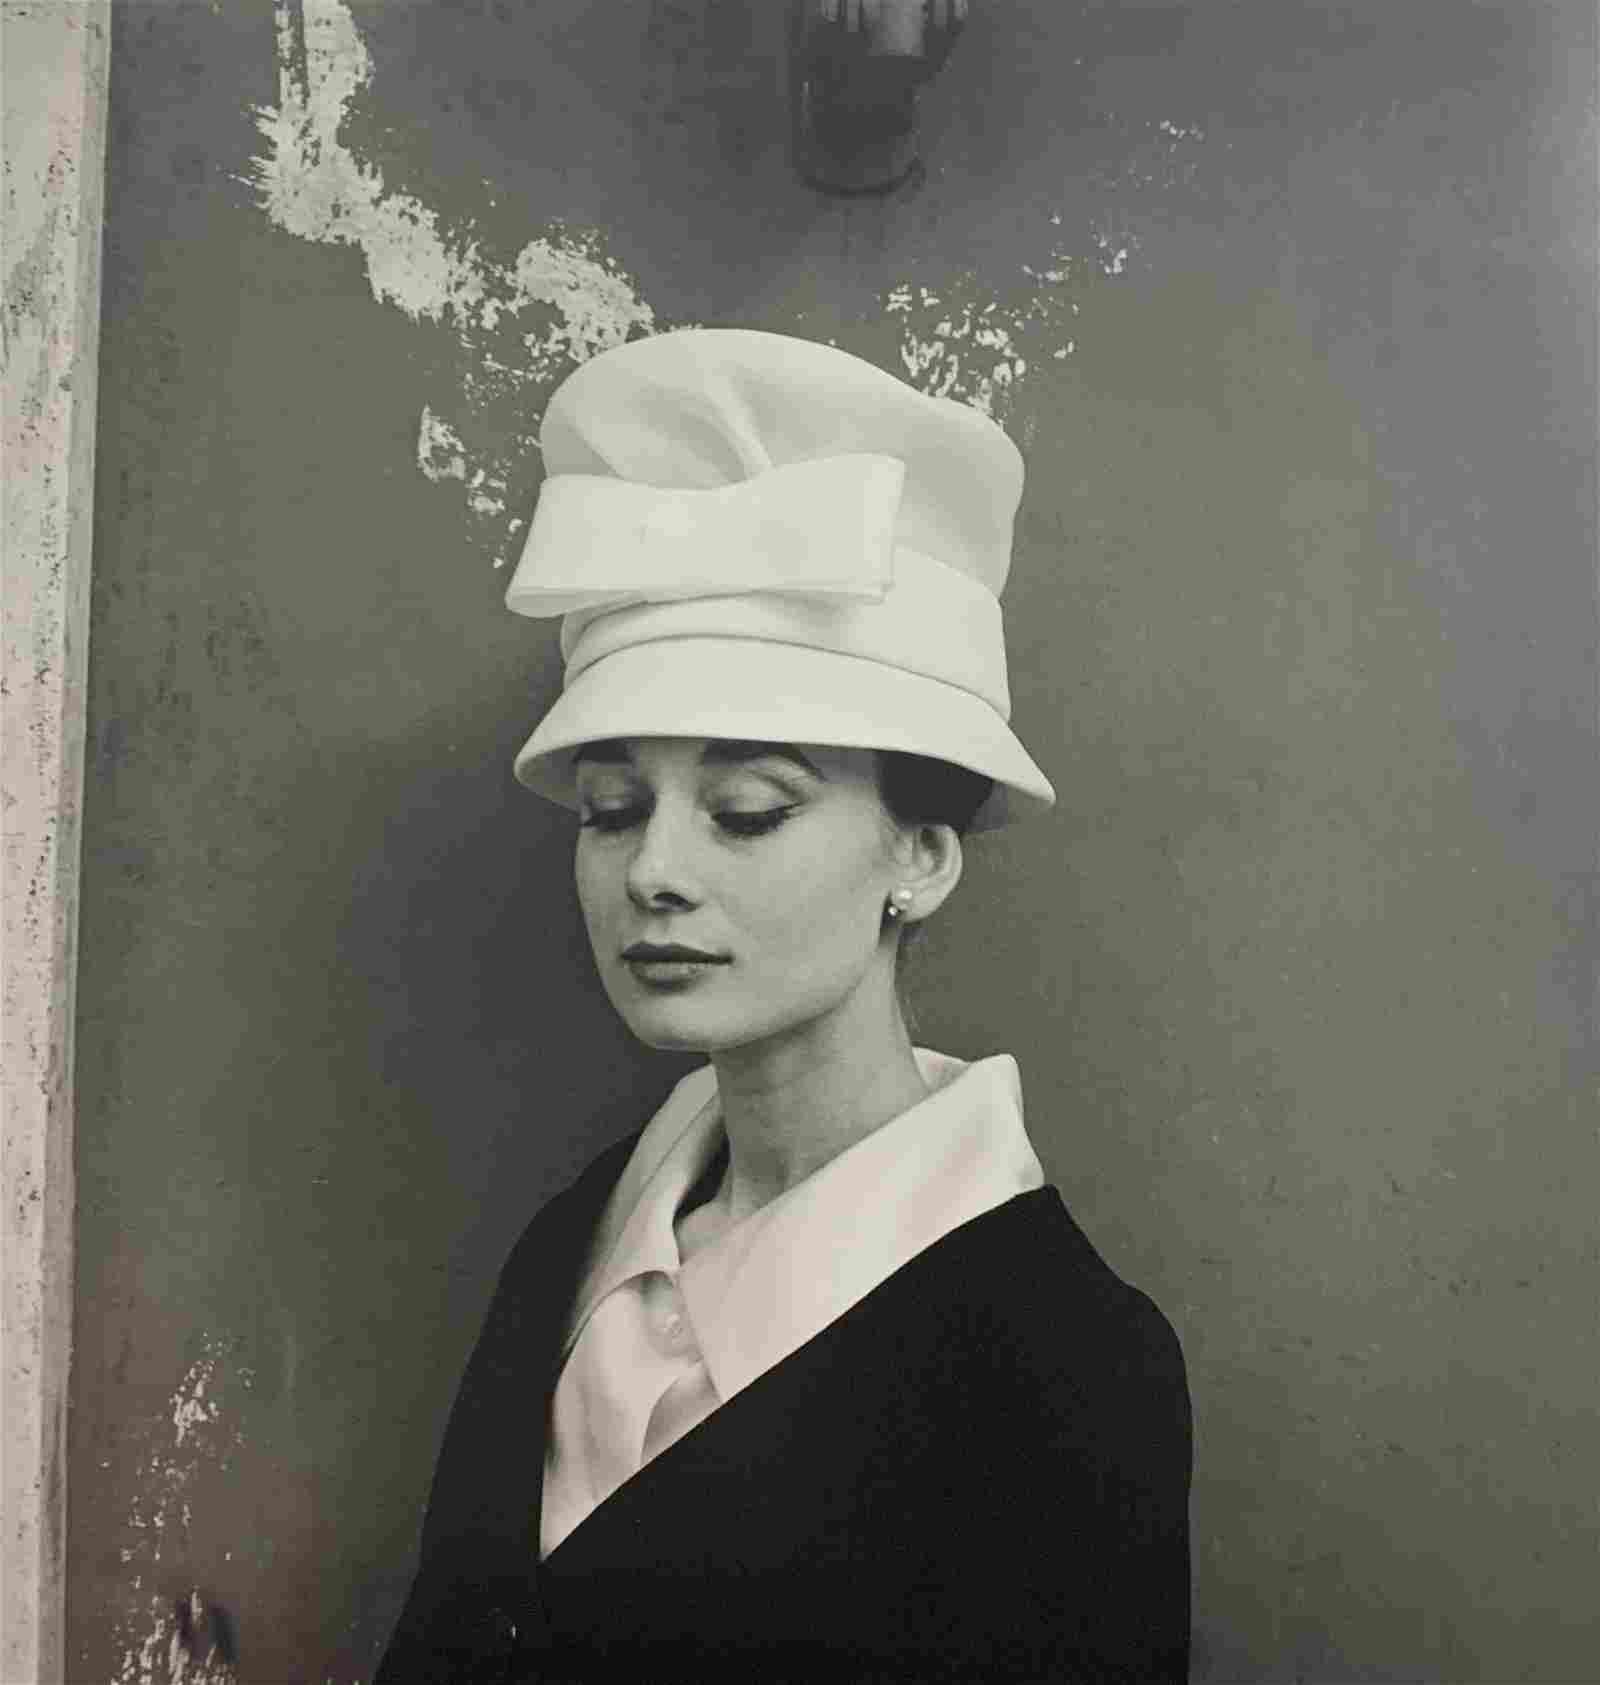 Cecil Beaton - Audrey Hepburn, Photo-Litho